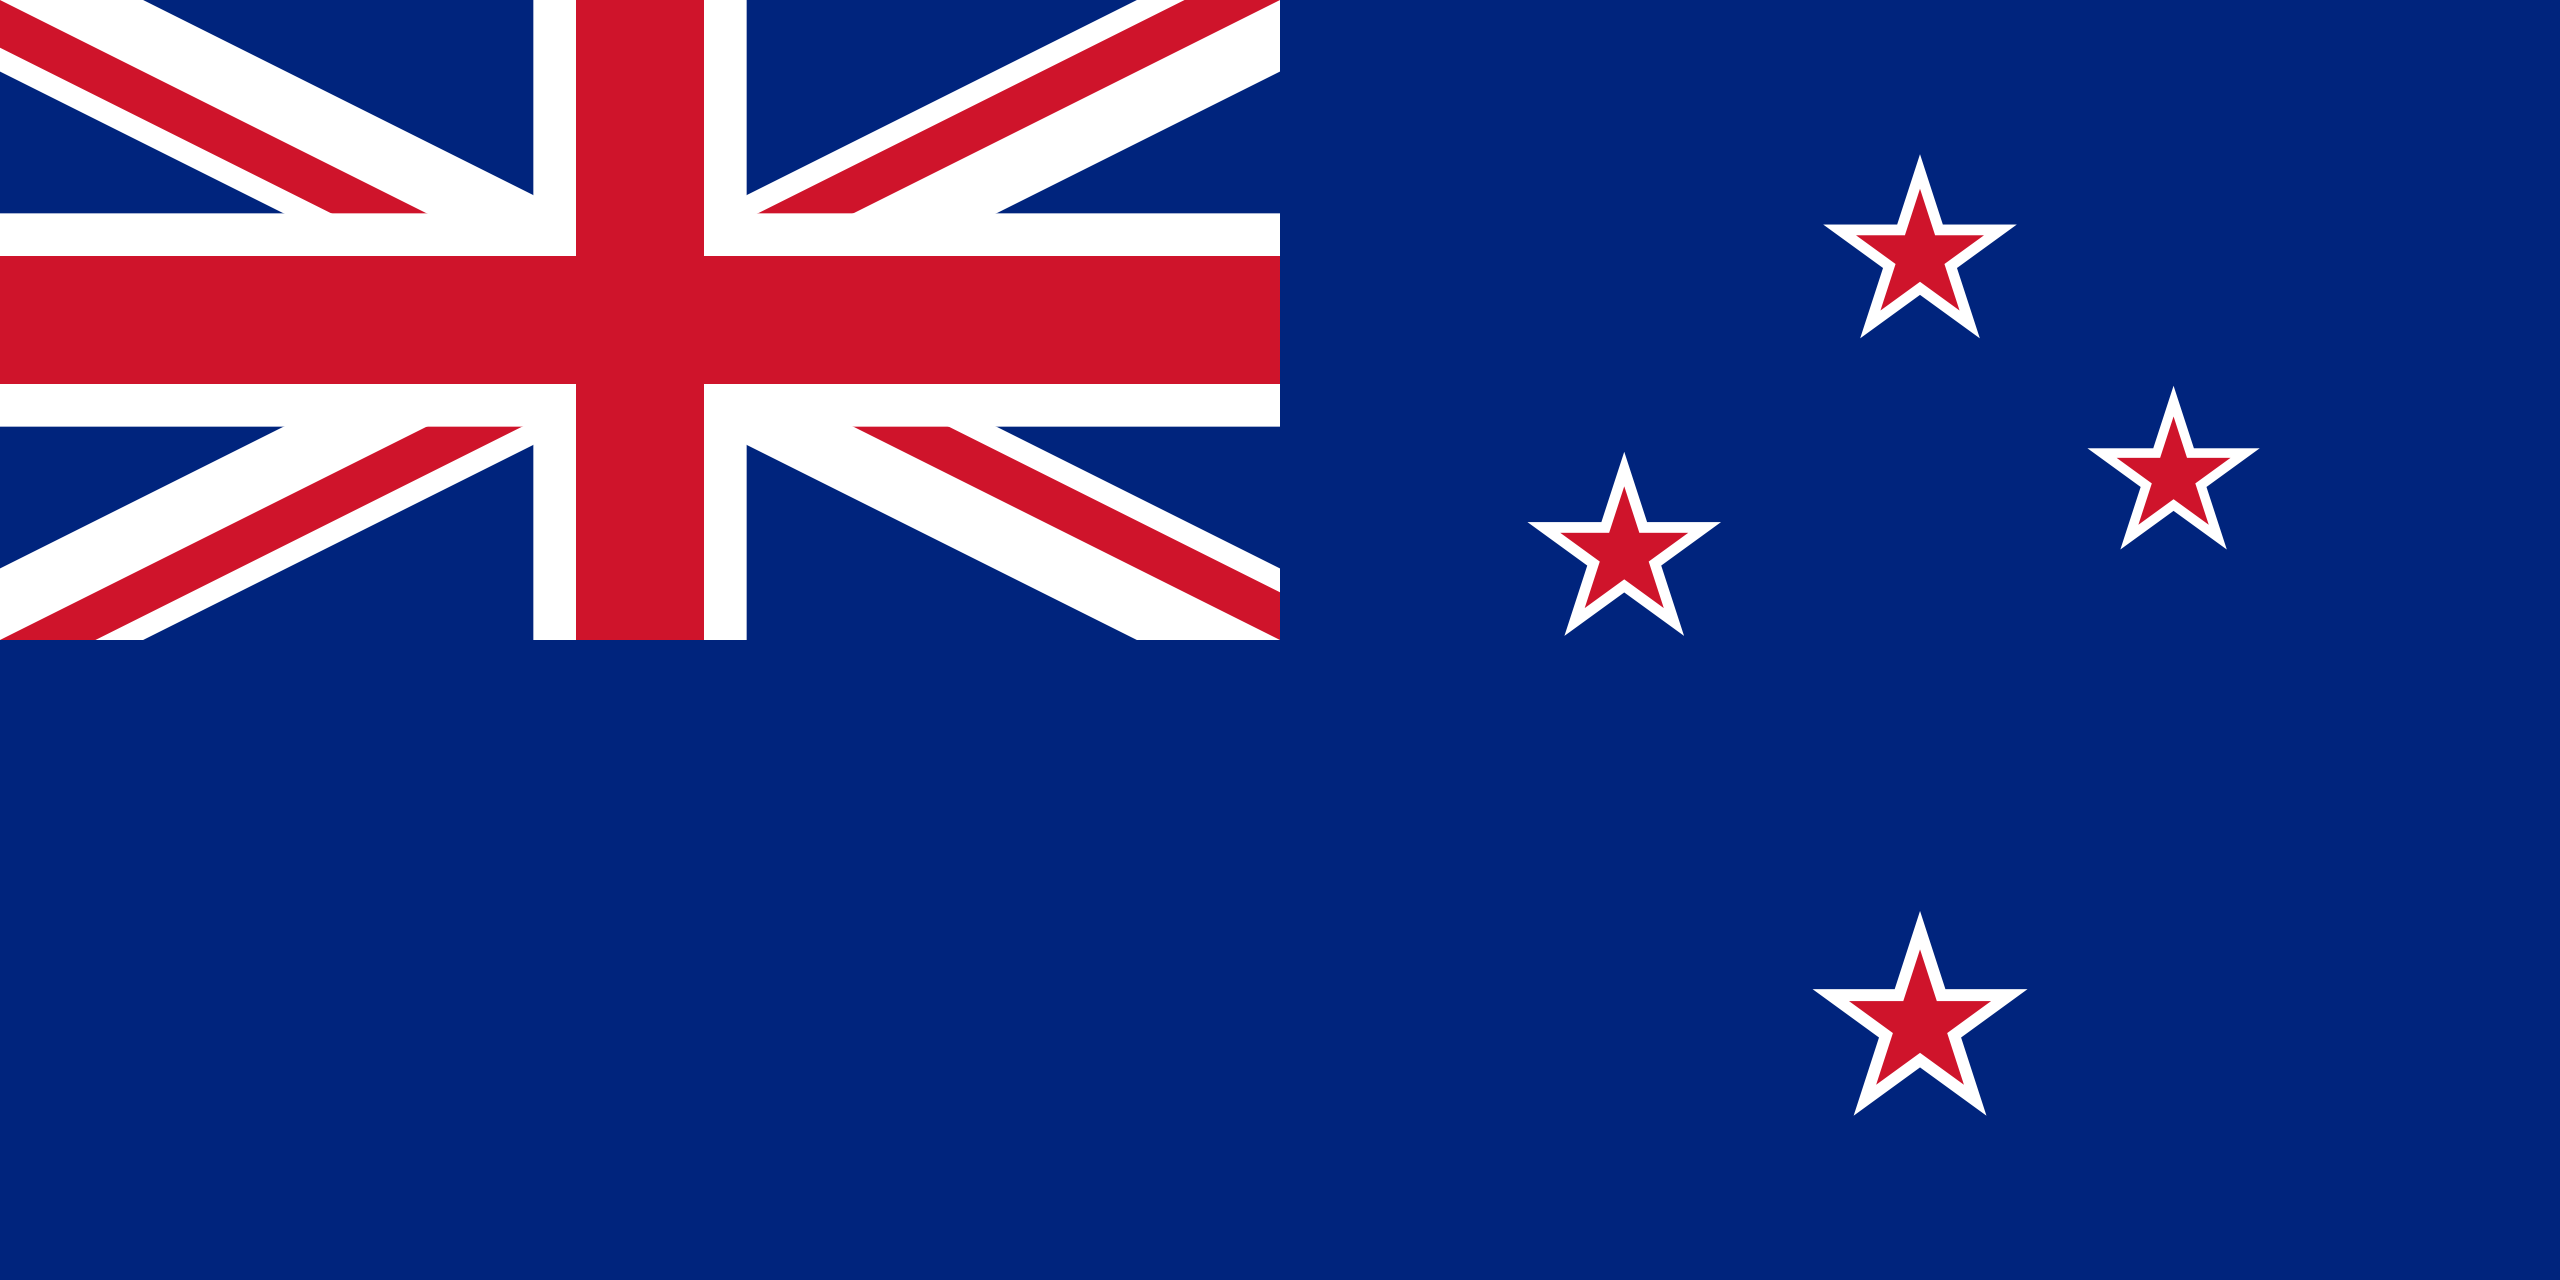 nueva zelanda, país, emblema, insignia, प्रतीक - HD वॉलपेपर - प्रोफेसर-falken.com